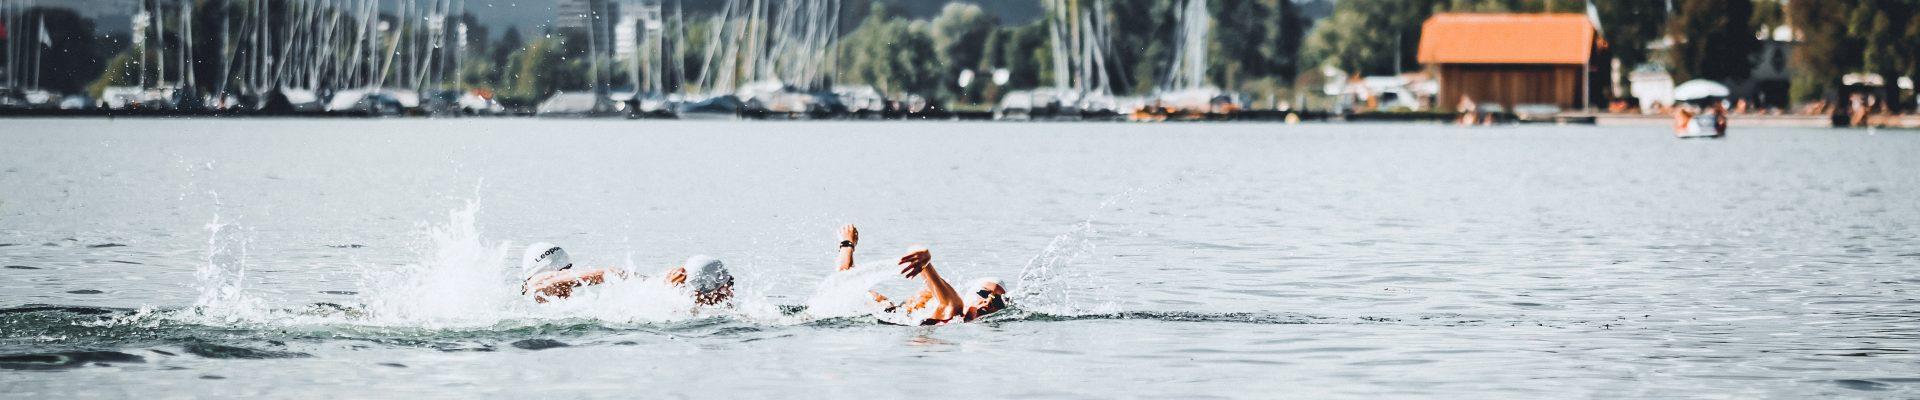 Statement on the shortened swim course: